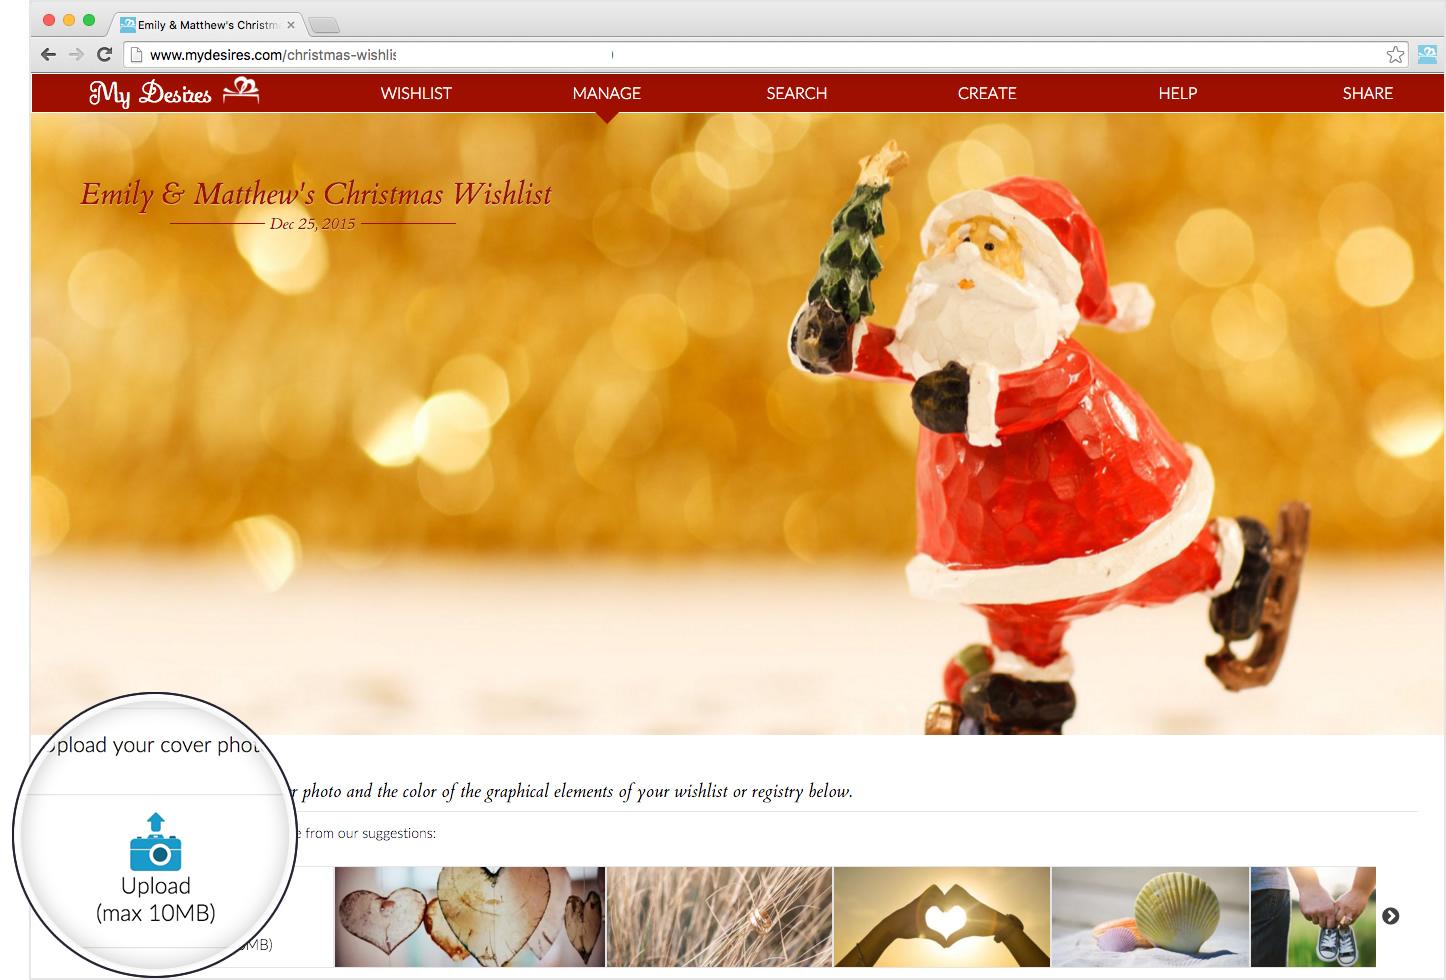 Online Christmas Wish List My Desires – Sample Christmas Wish List